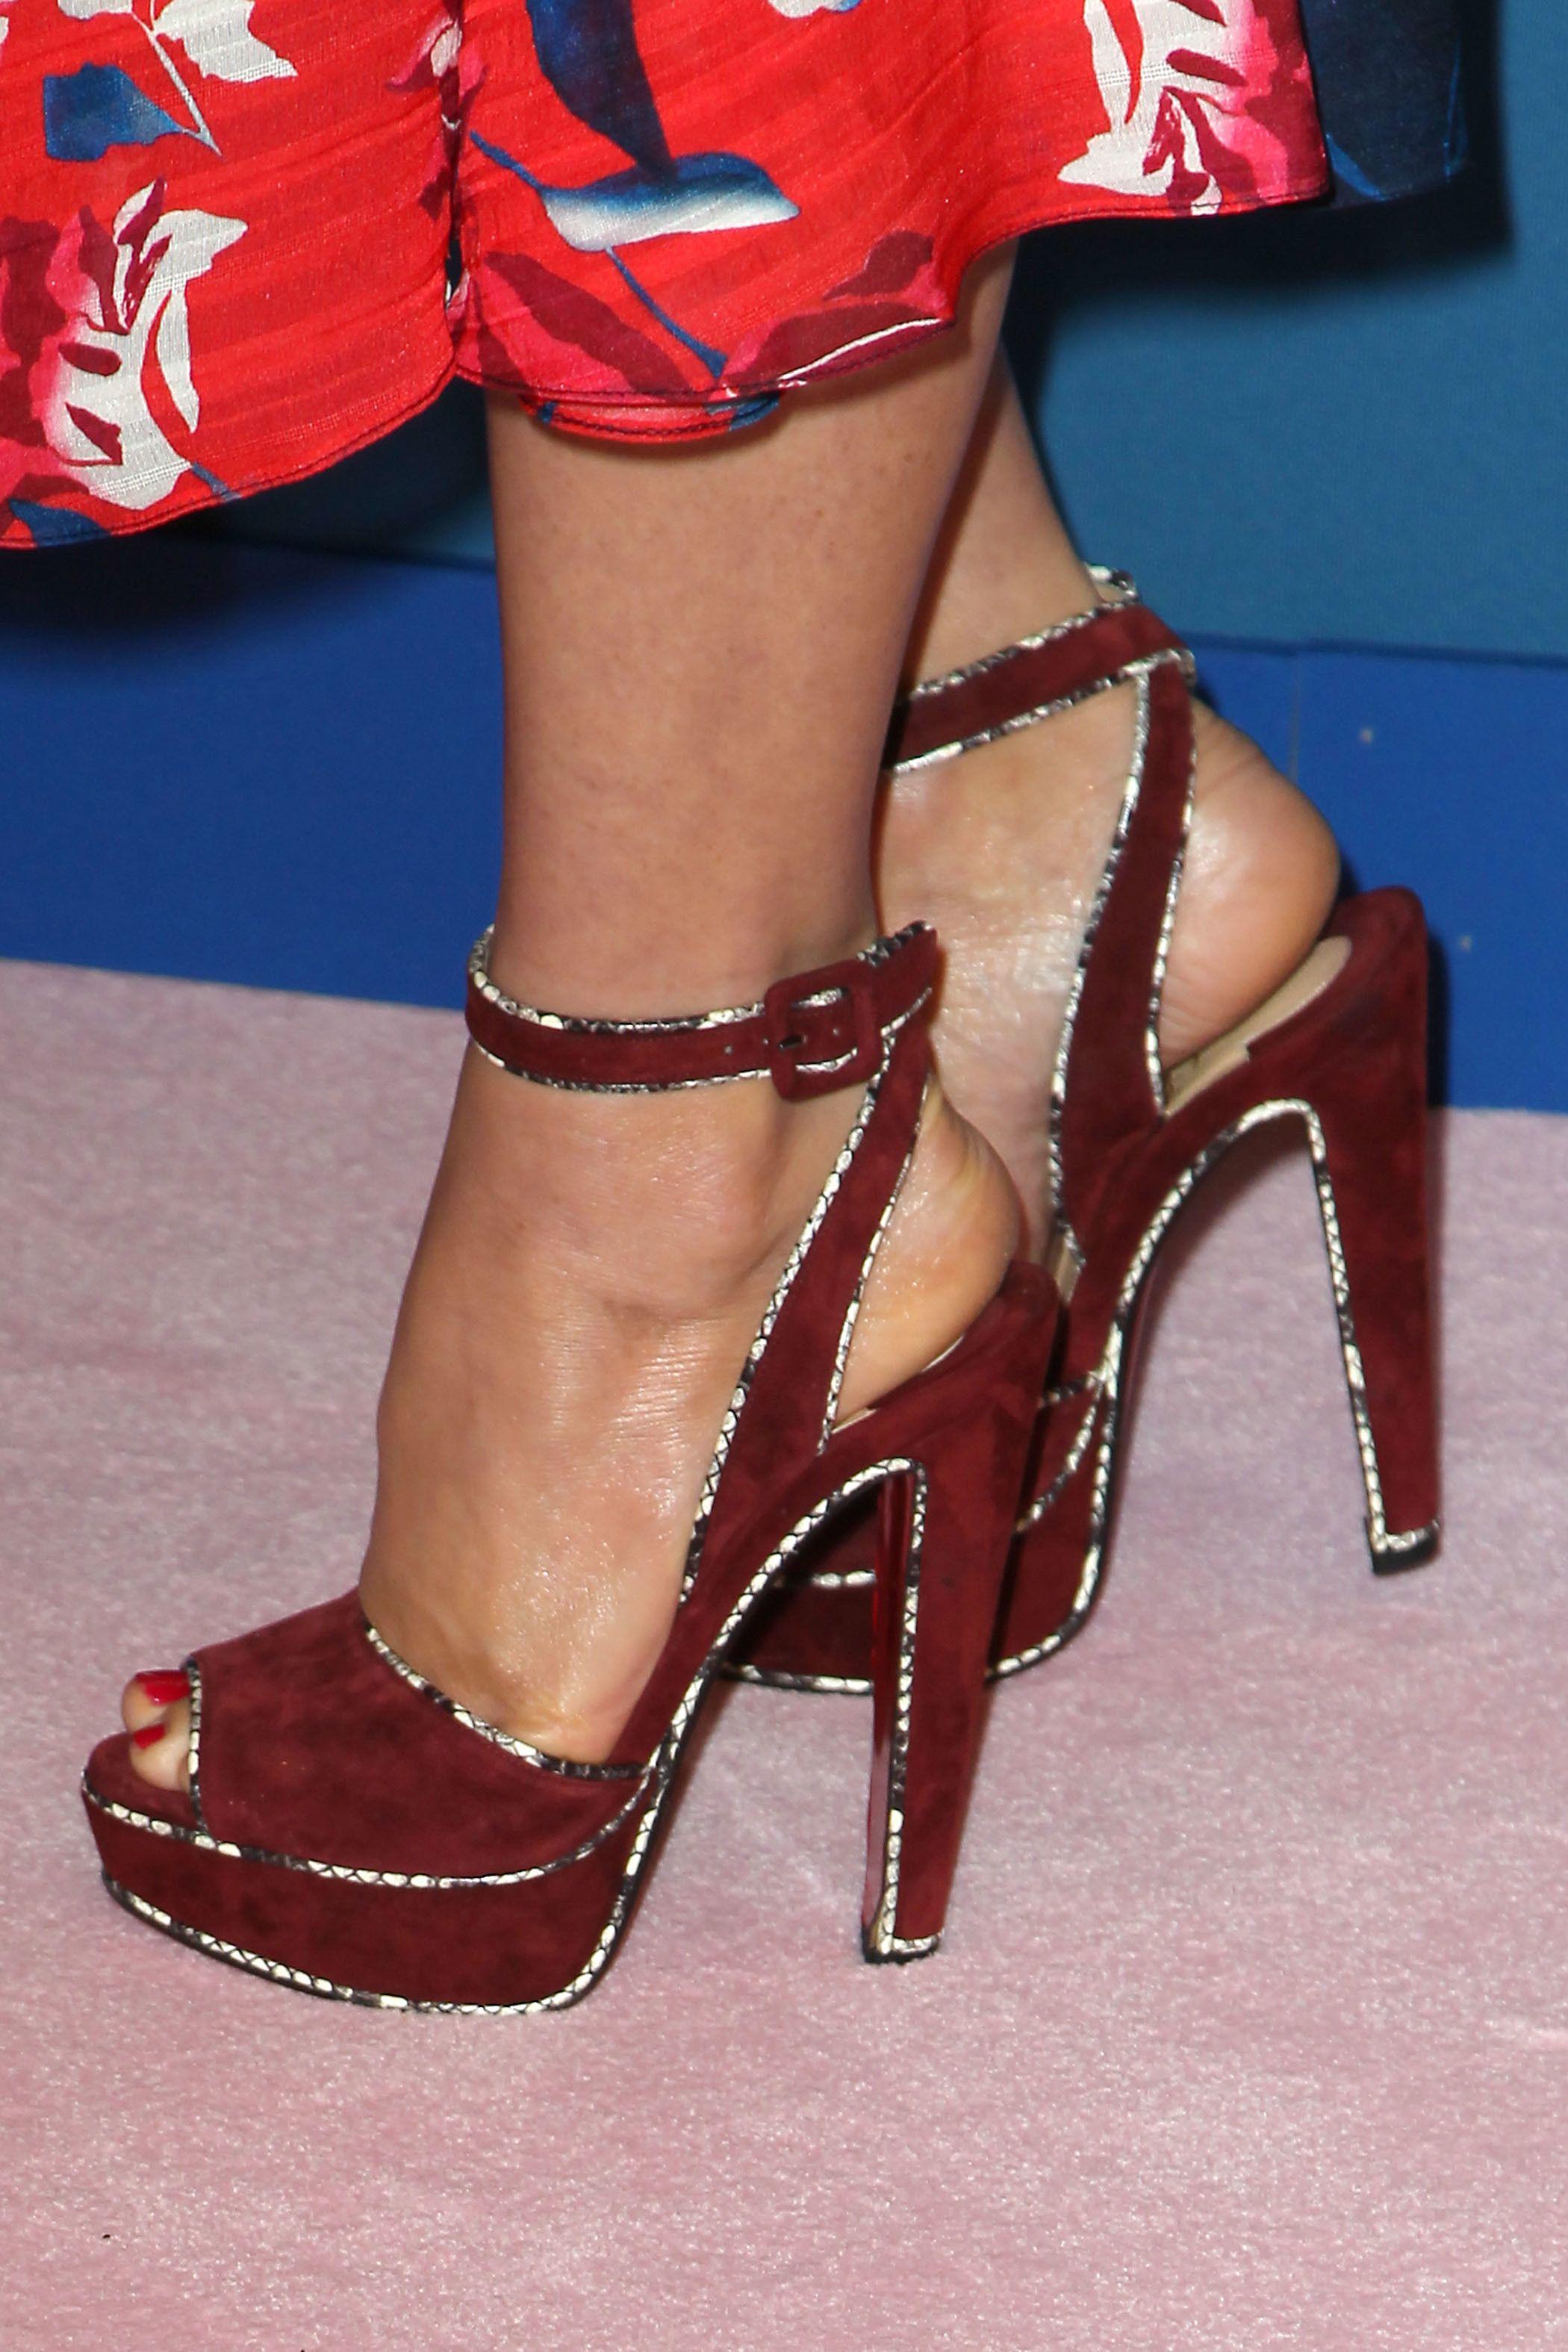 picture Olivia munn feet